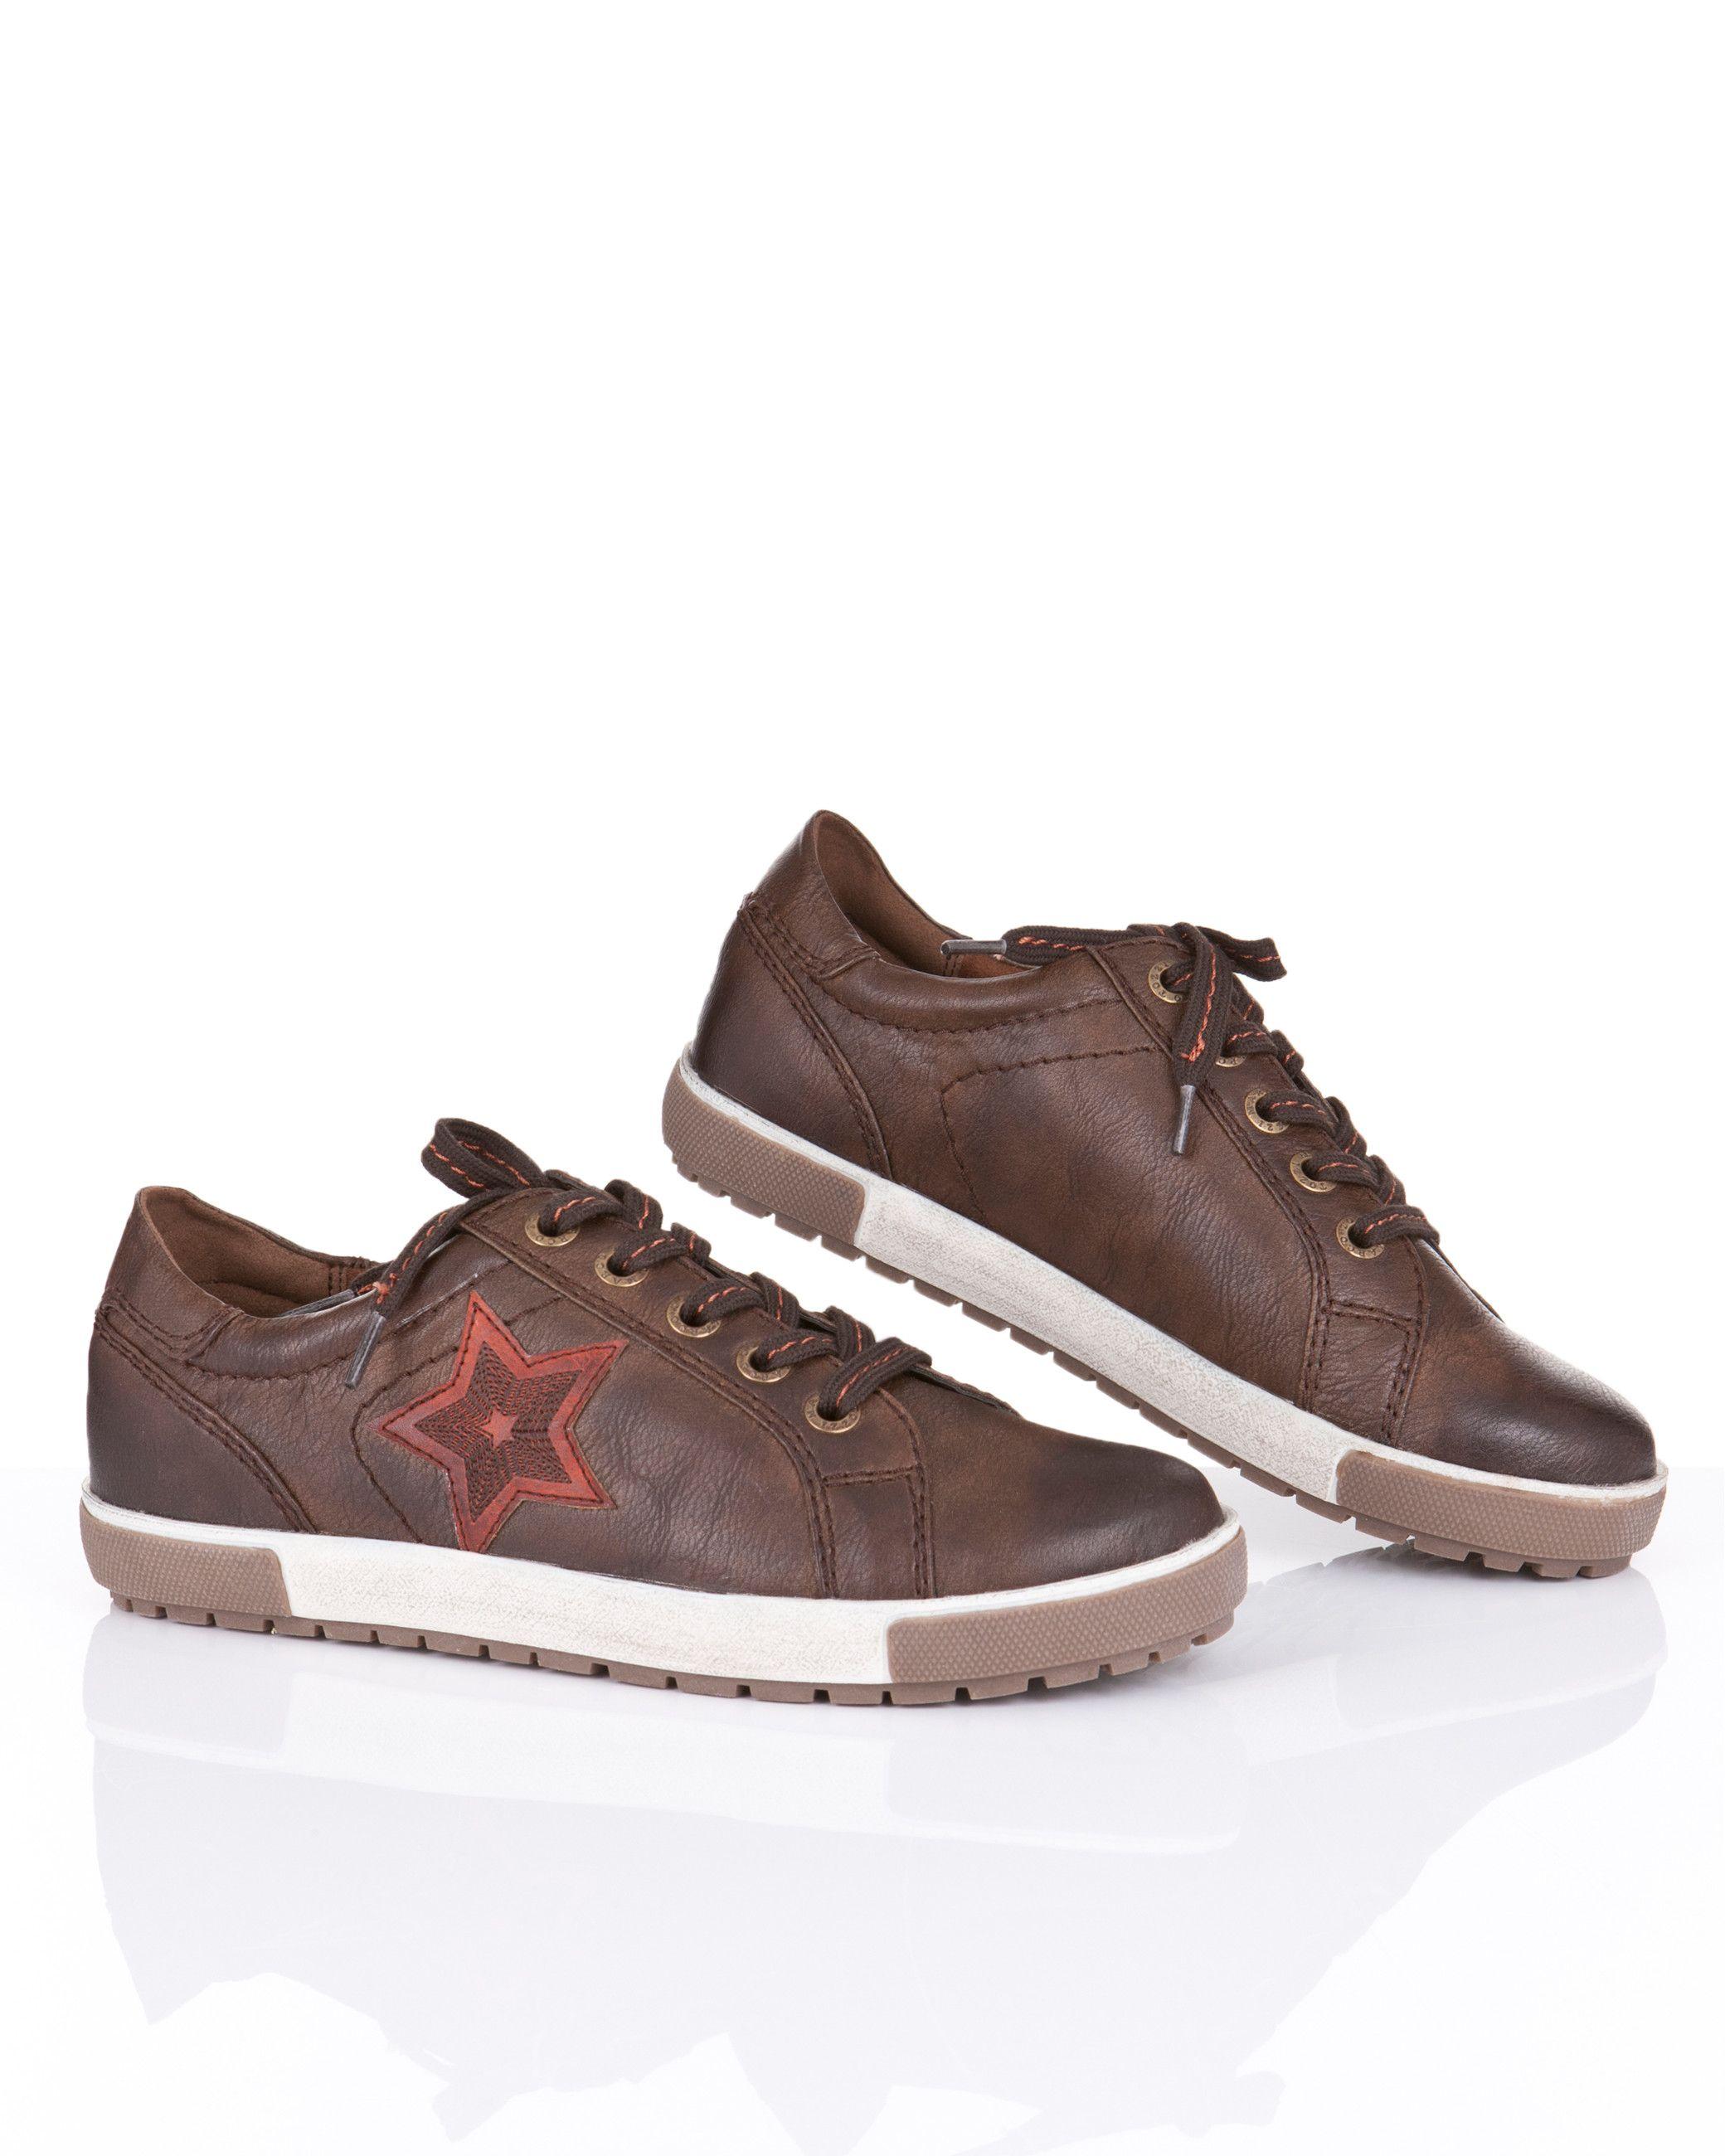 sale more photos hot product Marco Tozzi | Women's Fashion | Damen-Sneaker | #HSE24 ...